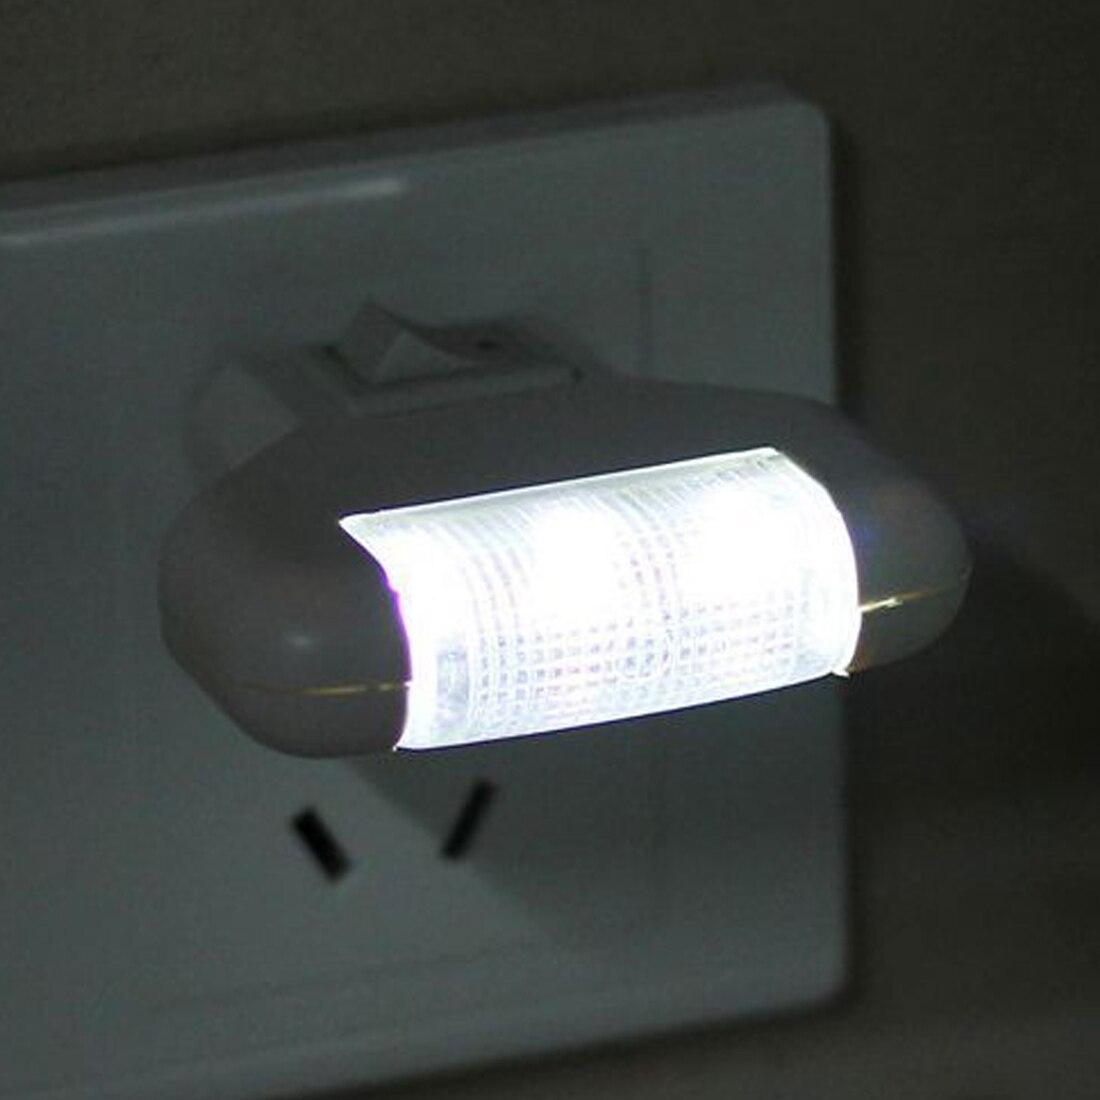 1pc LED Night Light 3 LED Eye Protect Wall Mounted Home Lighting Emergency Light LED T-type Plug-in